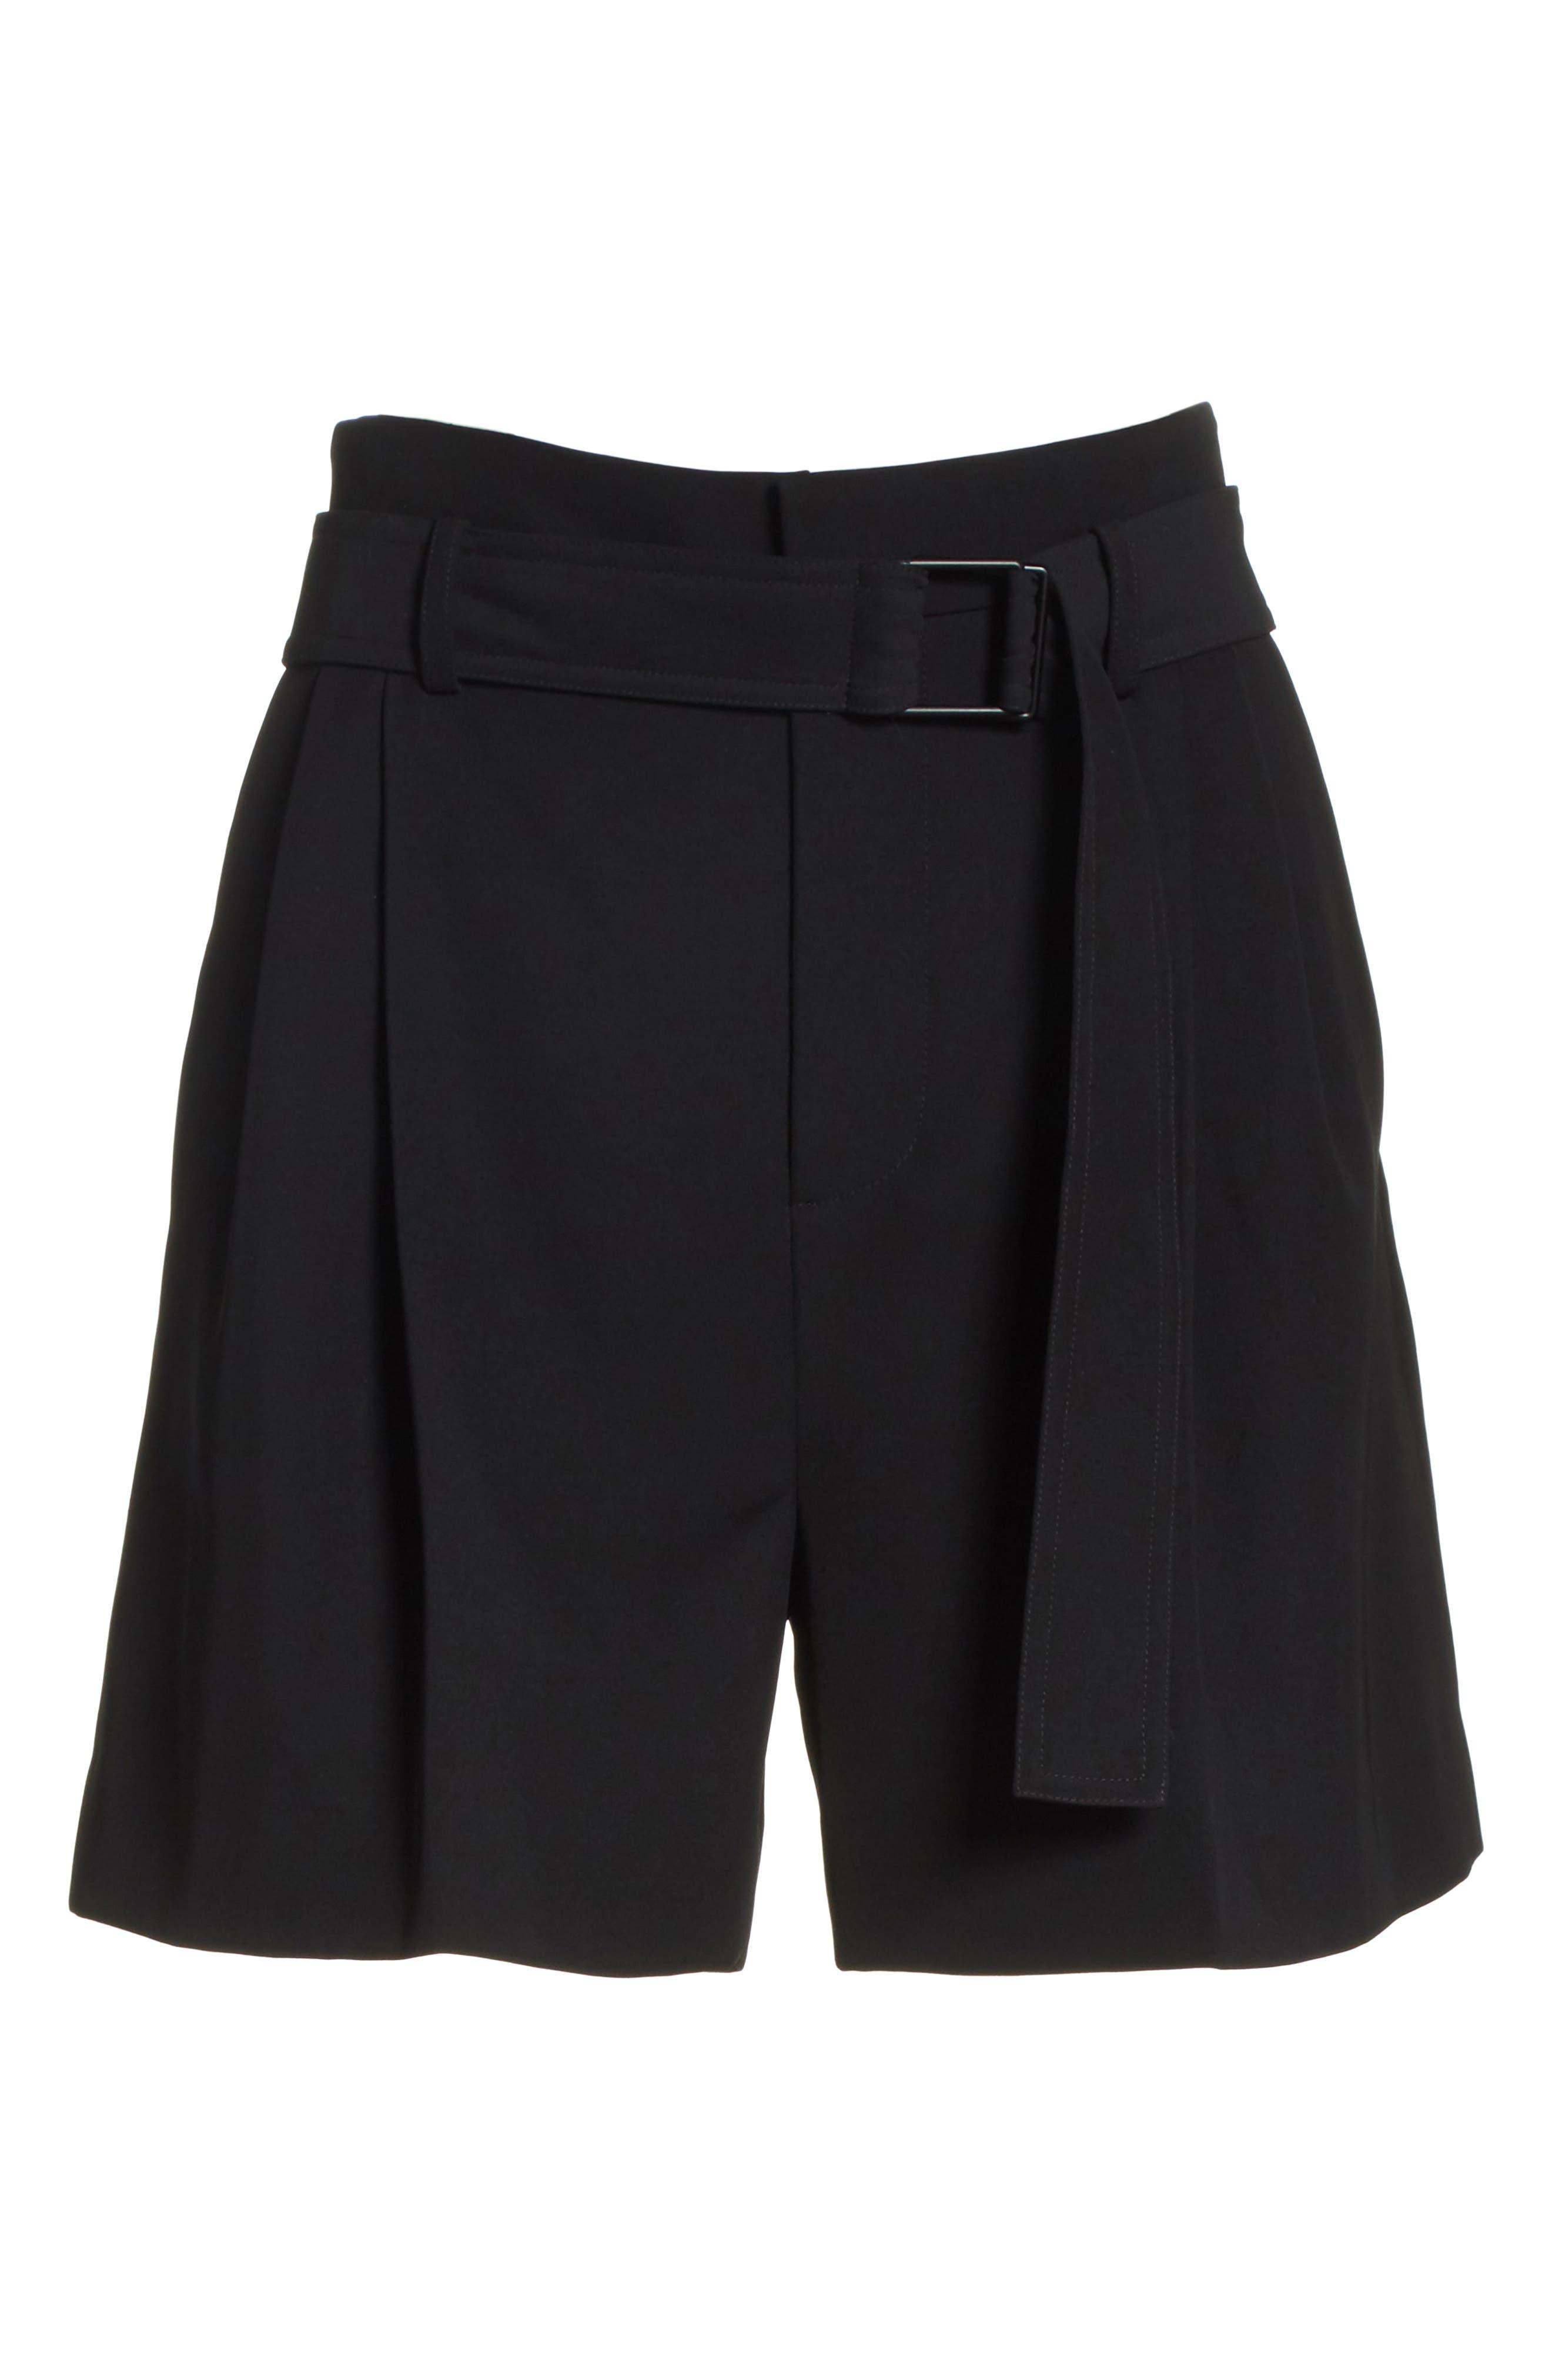 Belted Shorts,                             Alternate thumbnail 7, color,                             Black